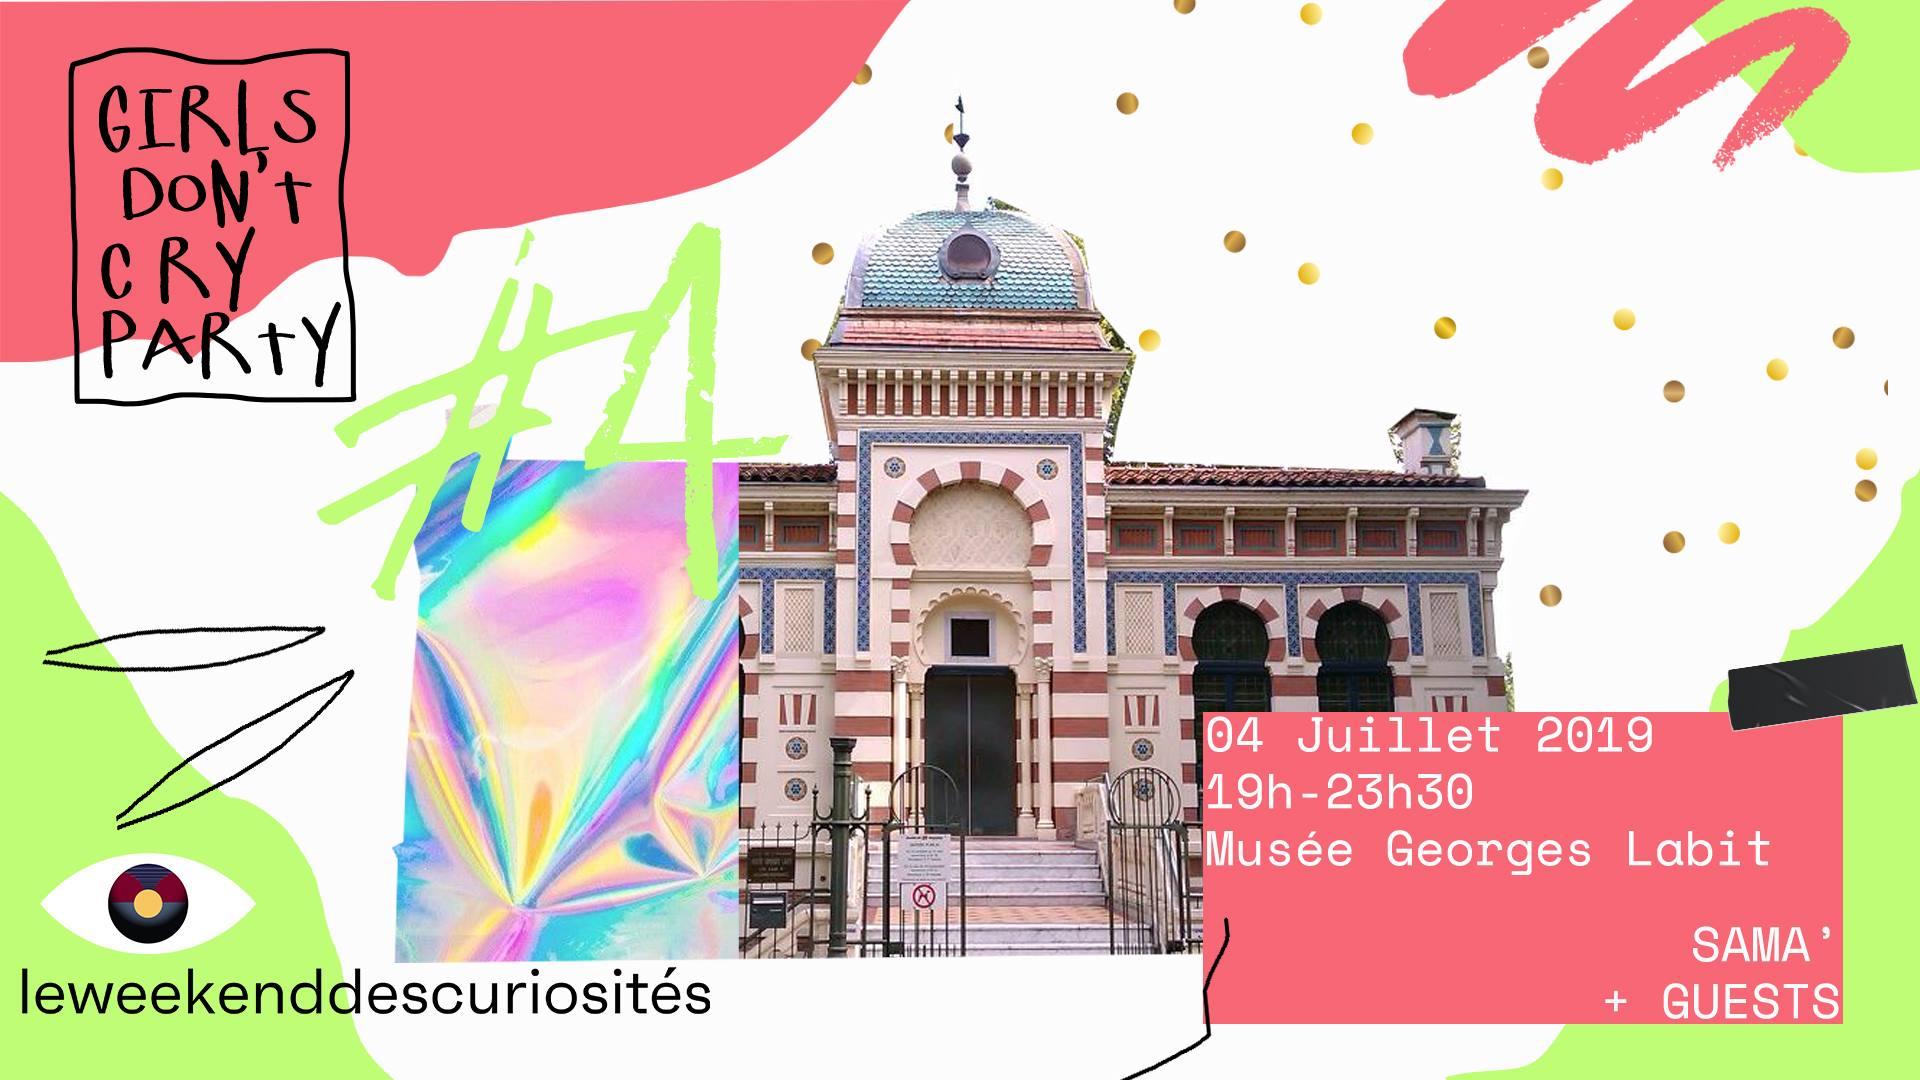 Girls Don't Cry Party #4 x Weekend des Curiosités